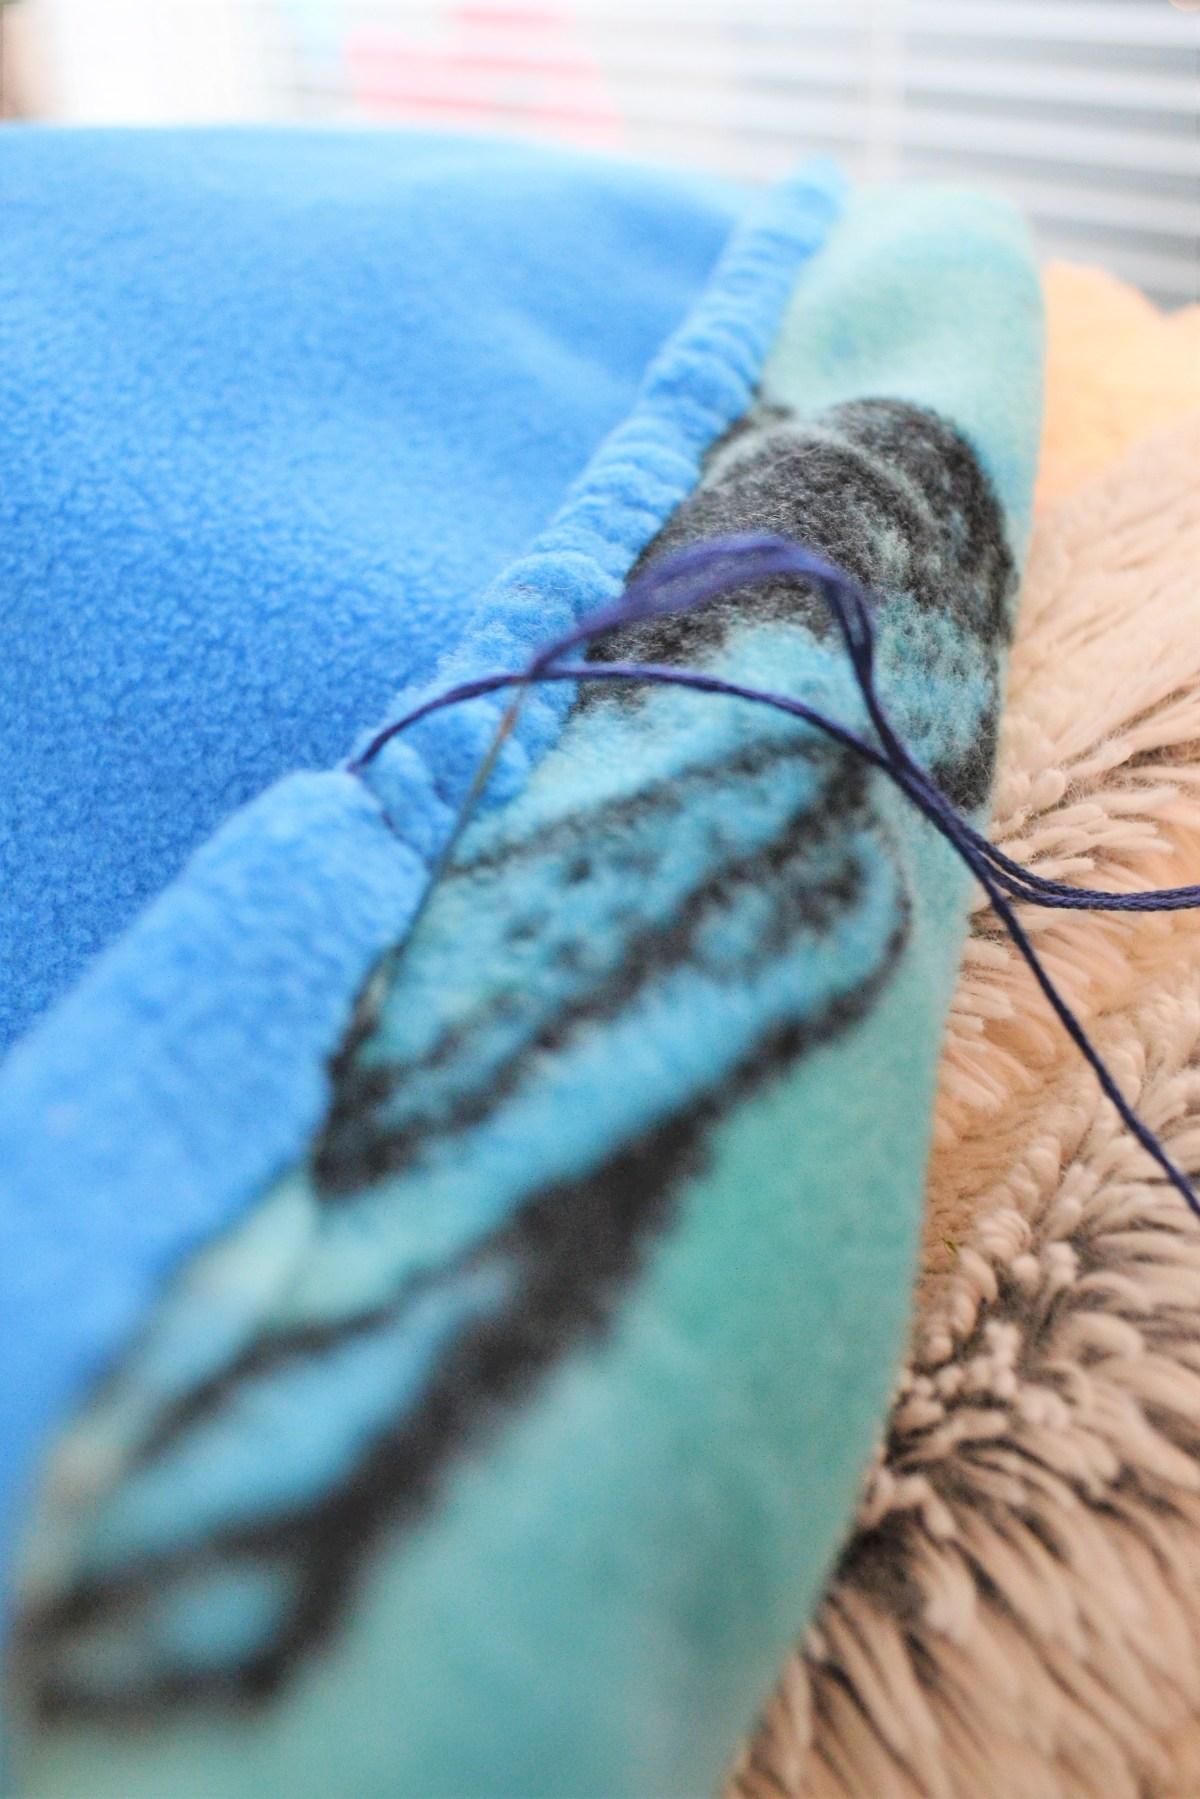 Hand Sewn Fleece Toddler Blanket Tutorial! - The Blanket Stitch! - The stitch